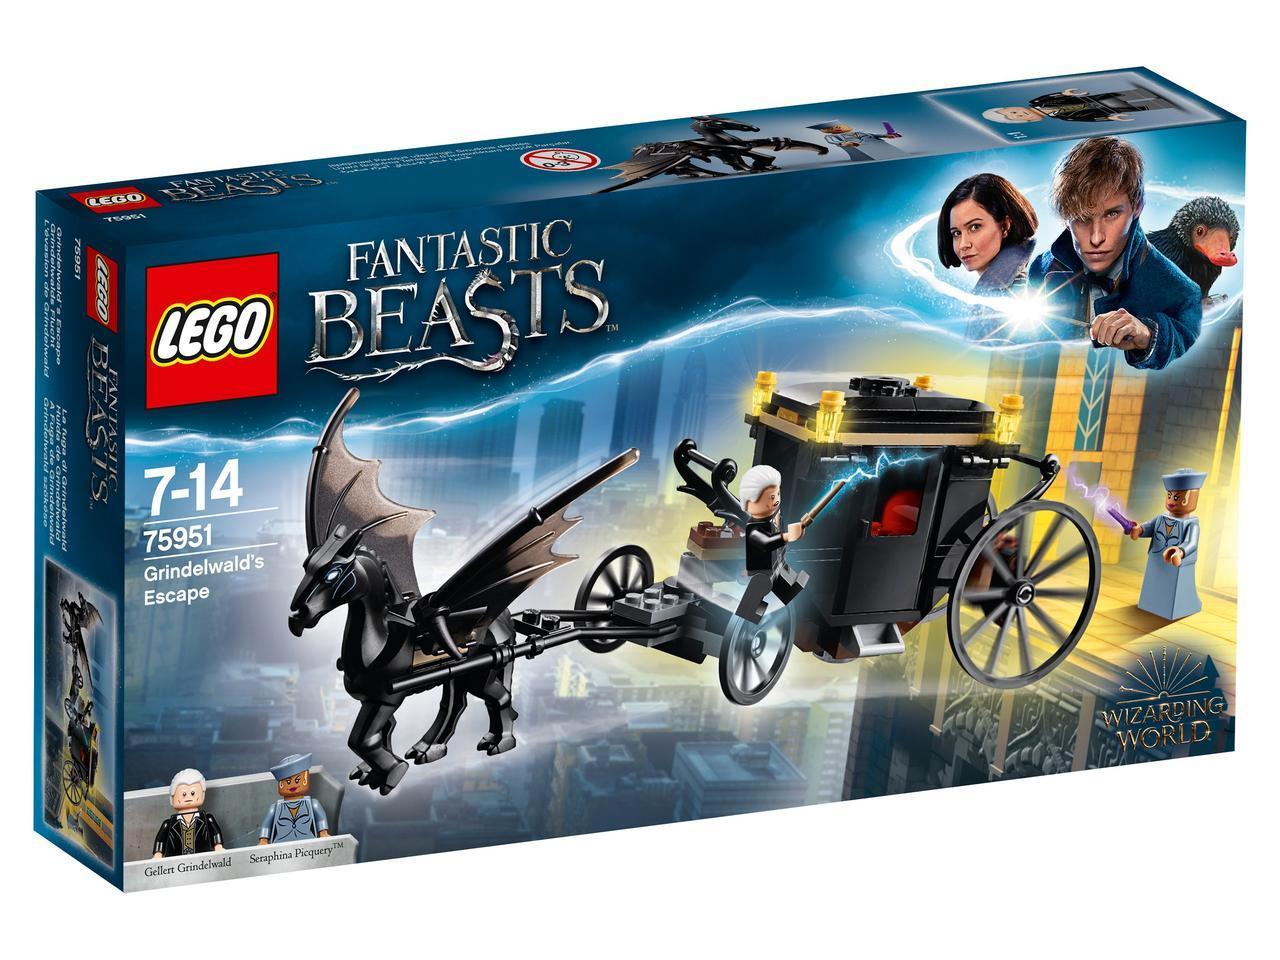 75951 Lego Harry Potter and Fantastic beasts Побег Грин-де-Вальда, Лего Гарри Поттер